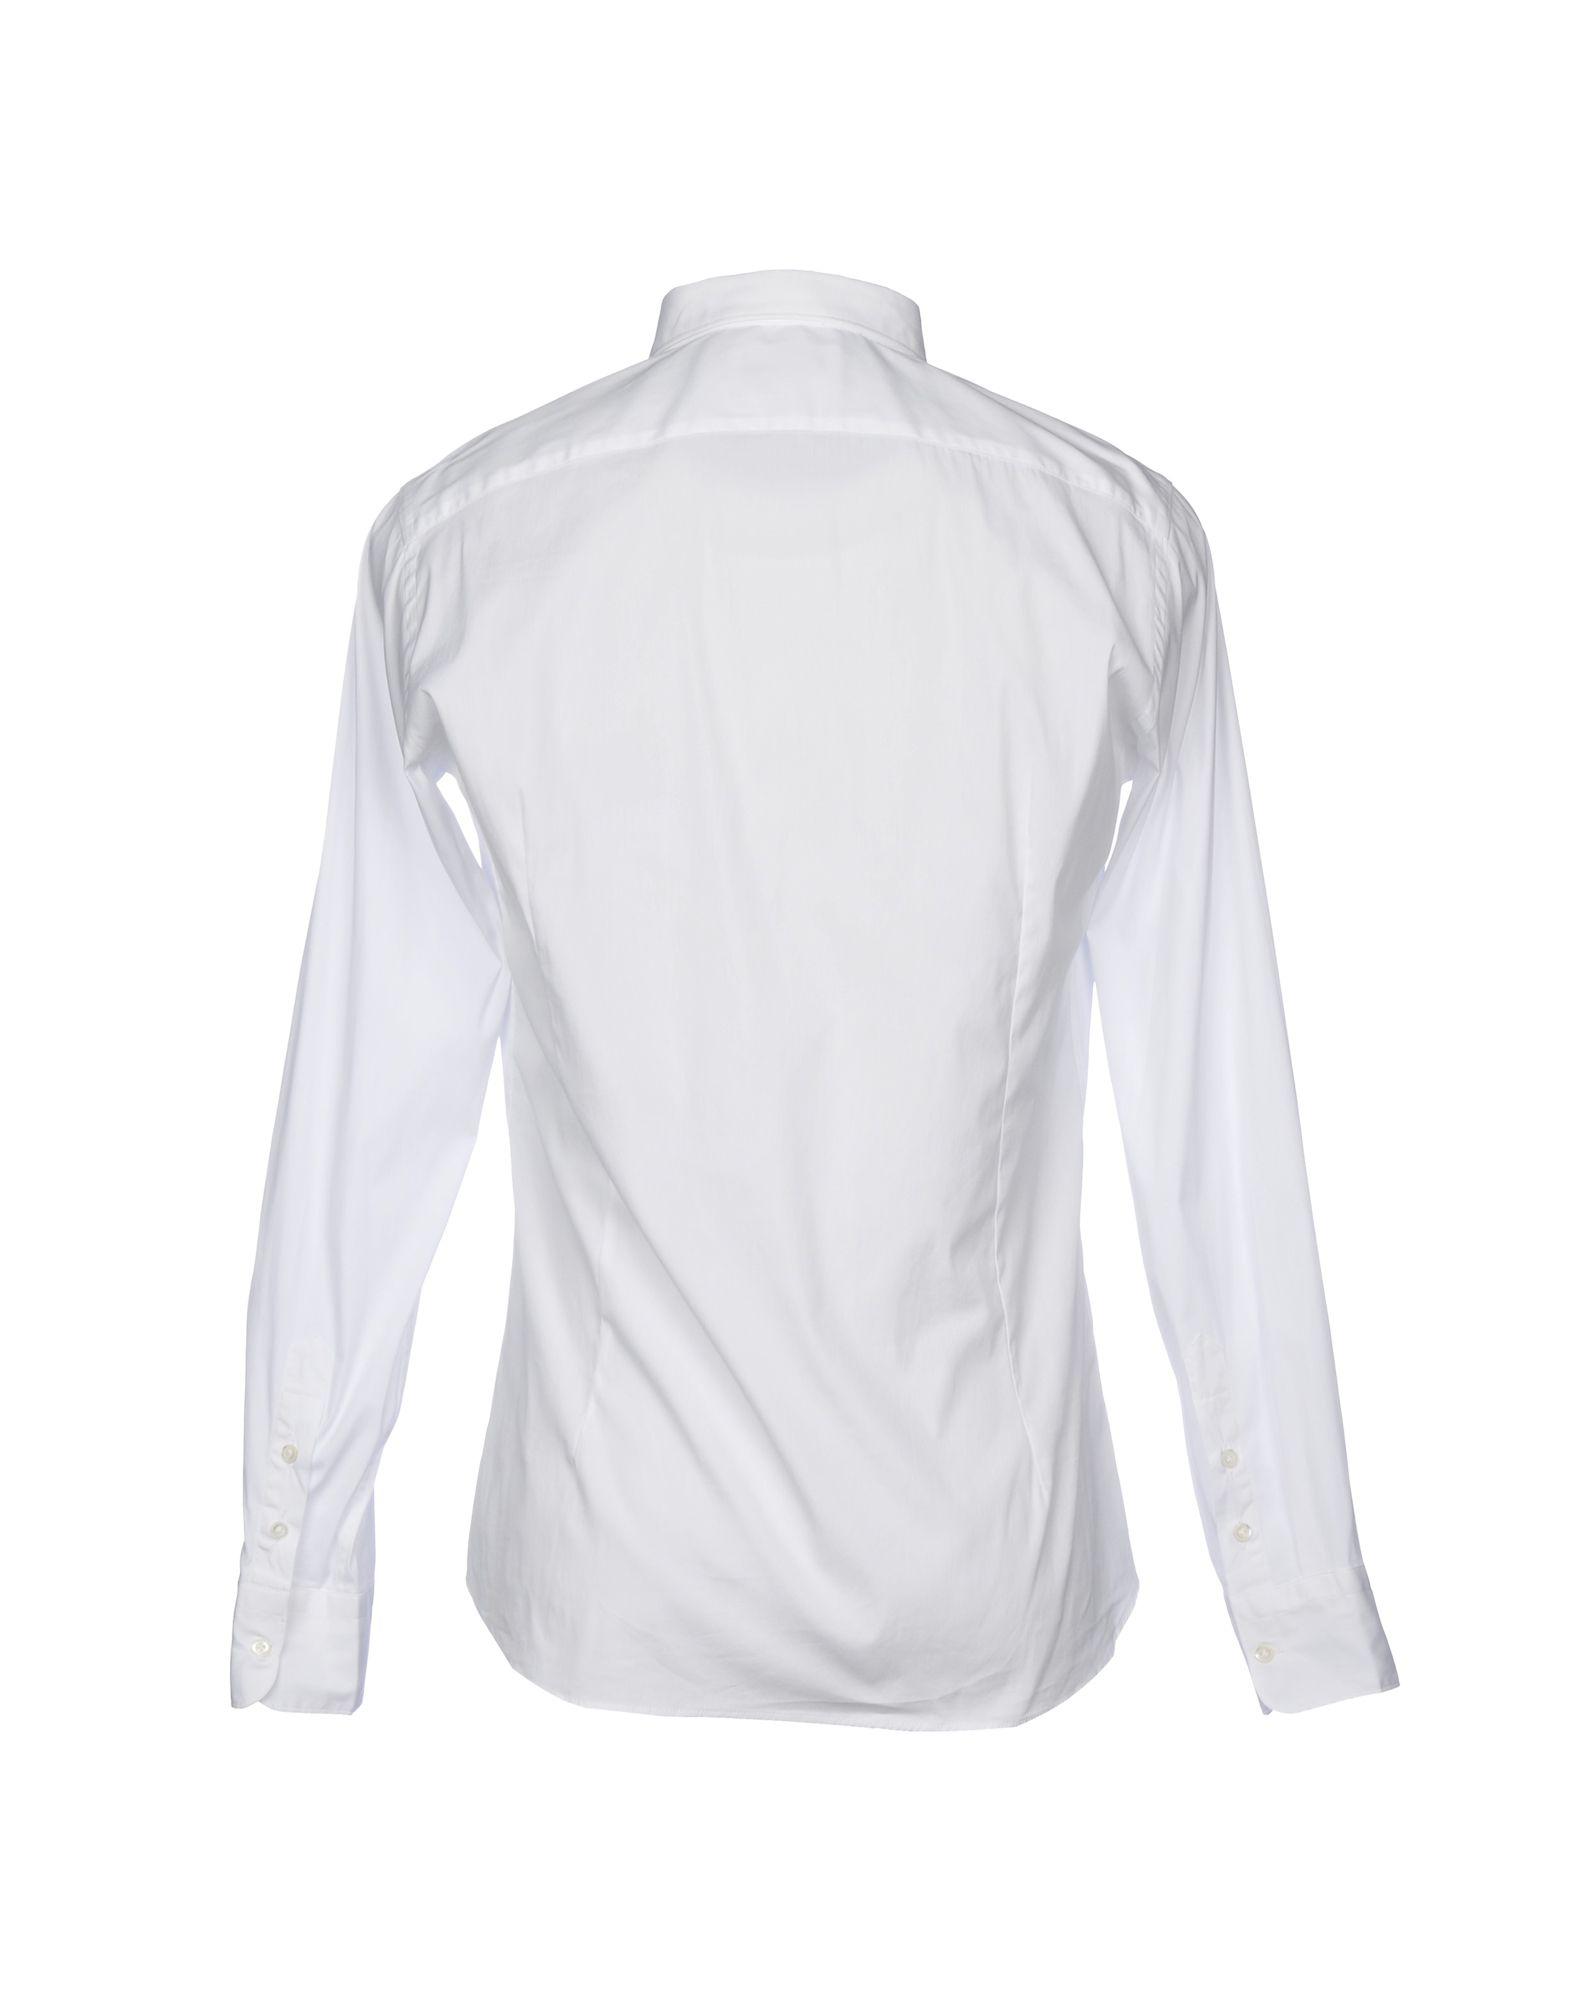 Camicia Tinta Unita Aglini Uomo - 38761550KK 38761550KK 38761550KK ca49fa